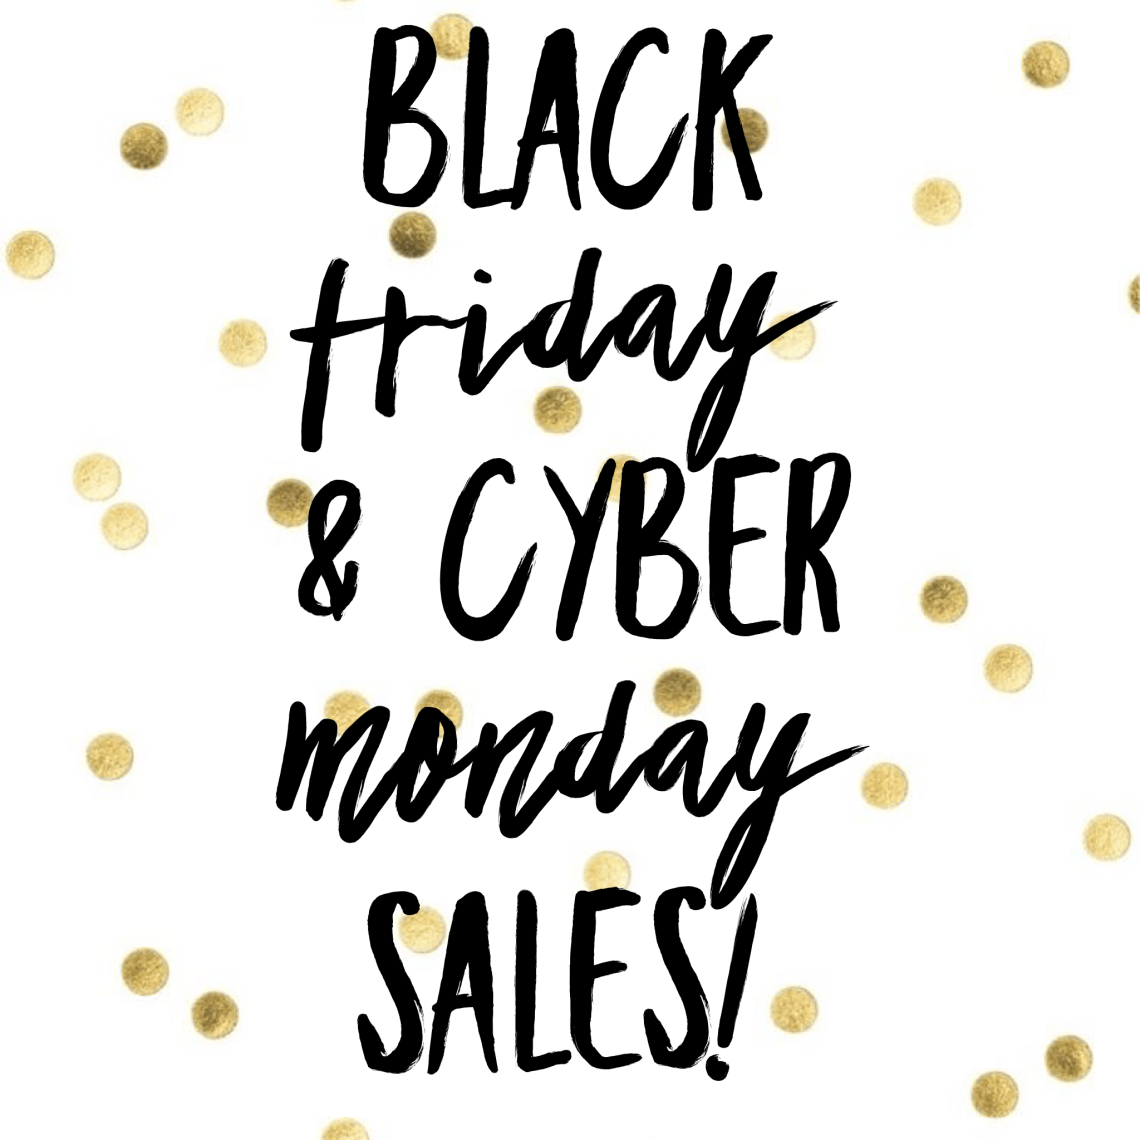 IMG 1497 - Black Friday & Cyber Monday Sales 2019!